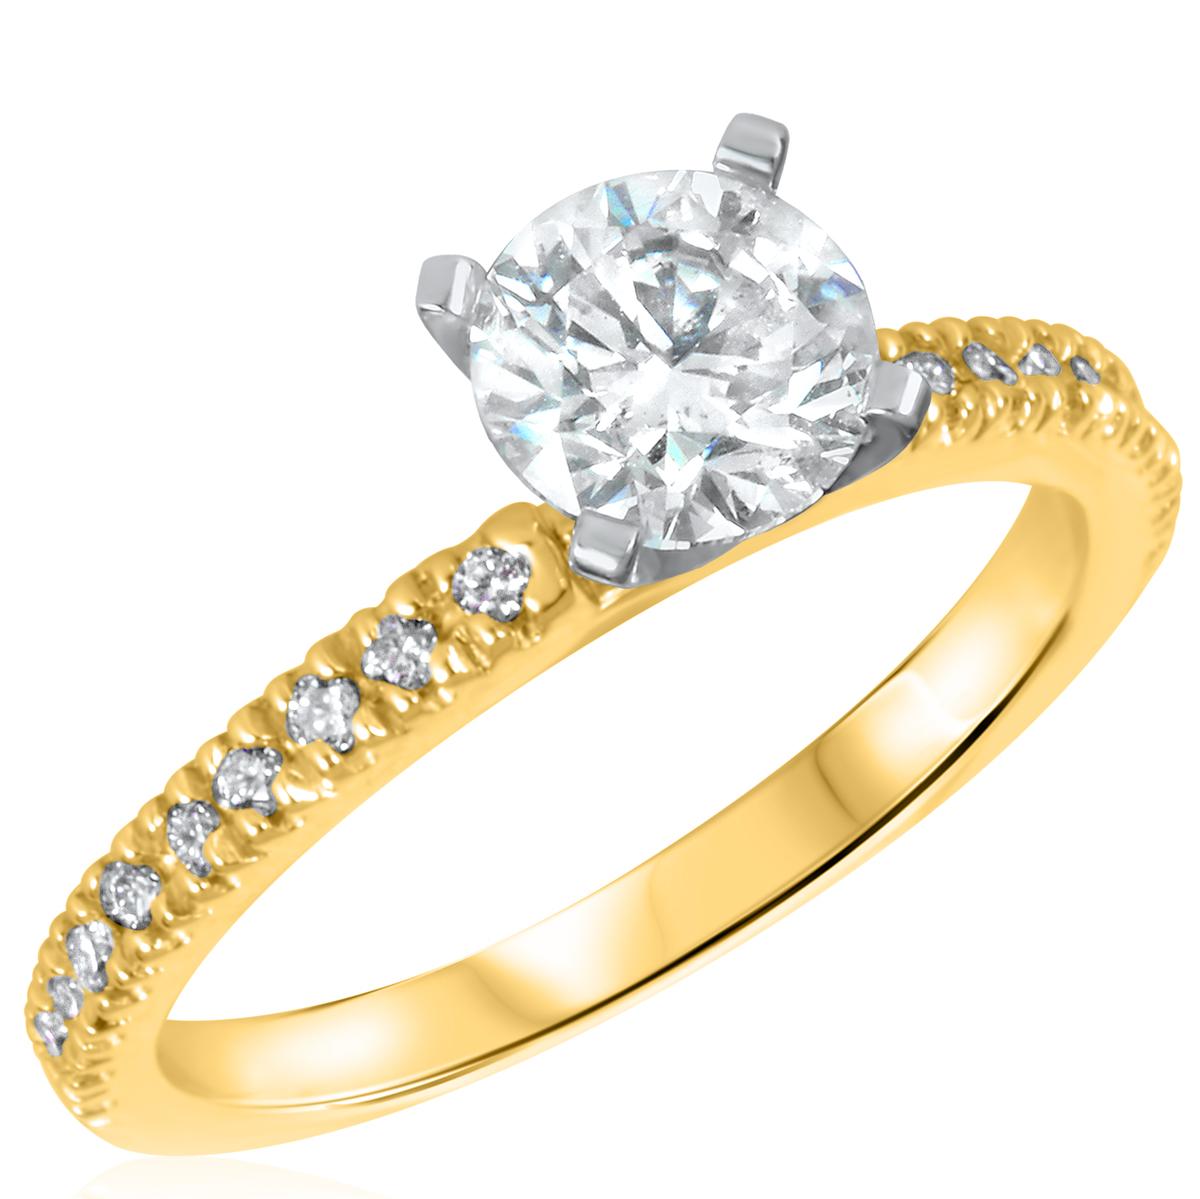 1 1/5 CT. T.W. Diamond Ladies Engagement Ring 14K Yellow Gold- Size 8